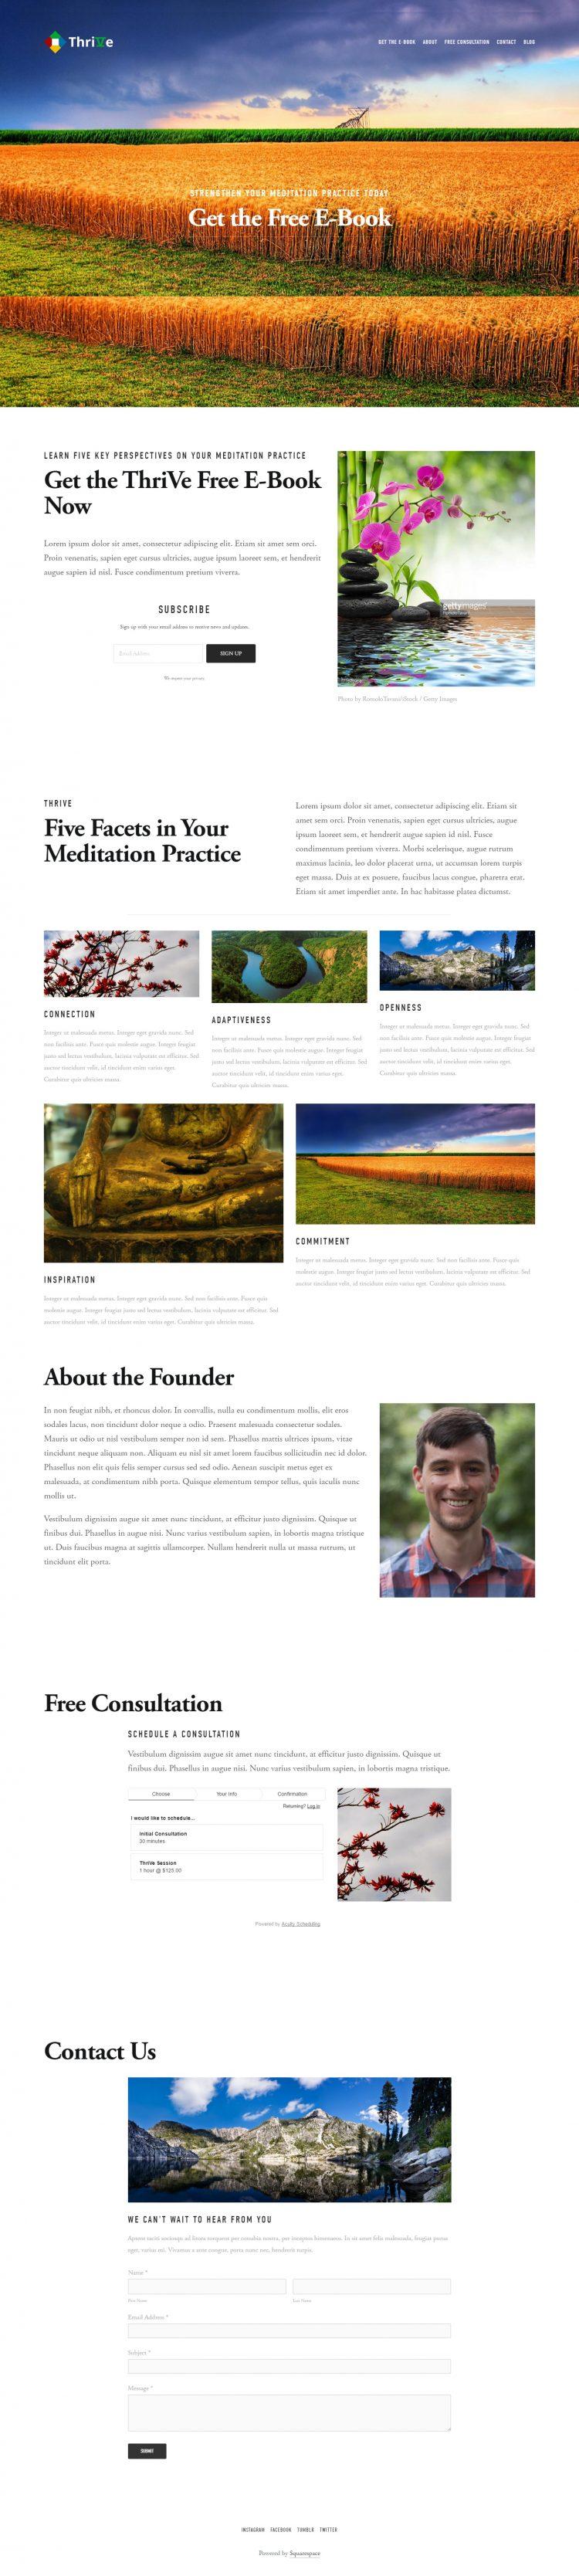 Squarespace vs. WordPress site comparison | Squarespace screenshot